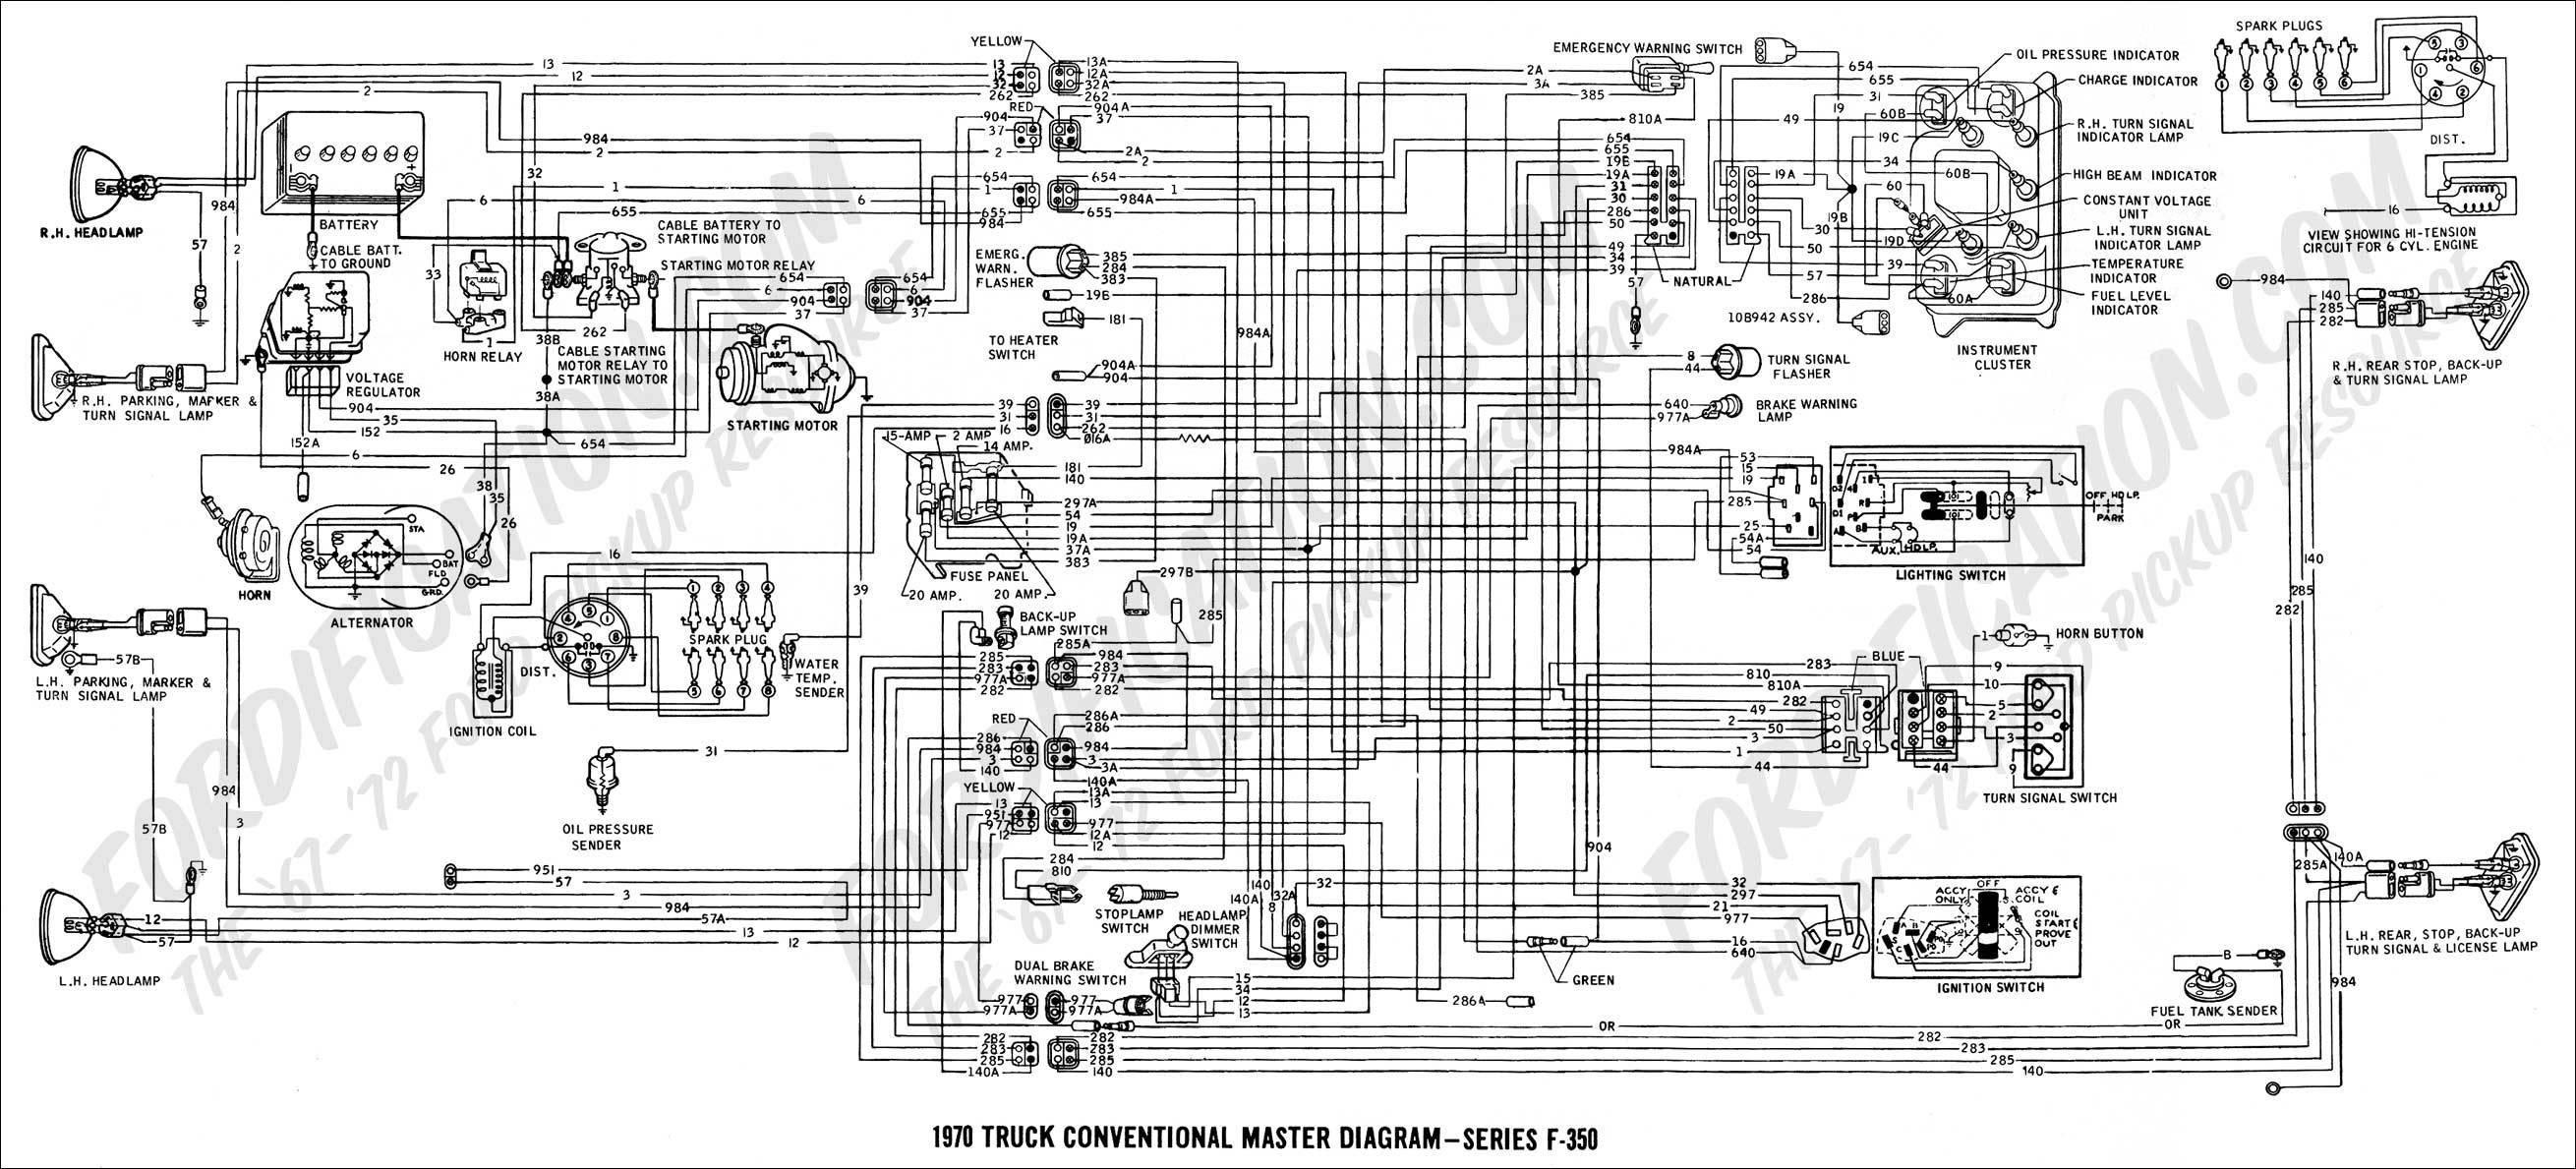 Ford F250 Wiring Diagram | Wiring Diagram Image